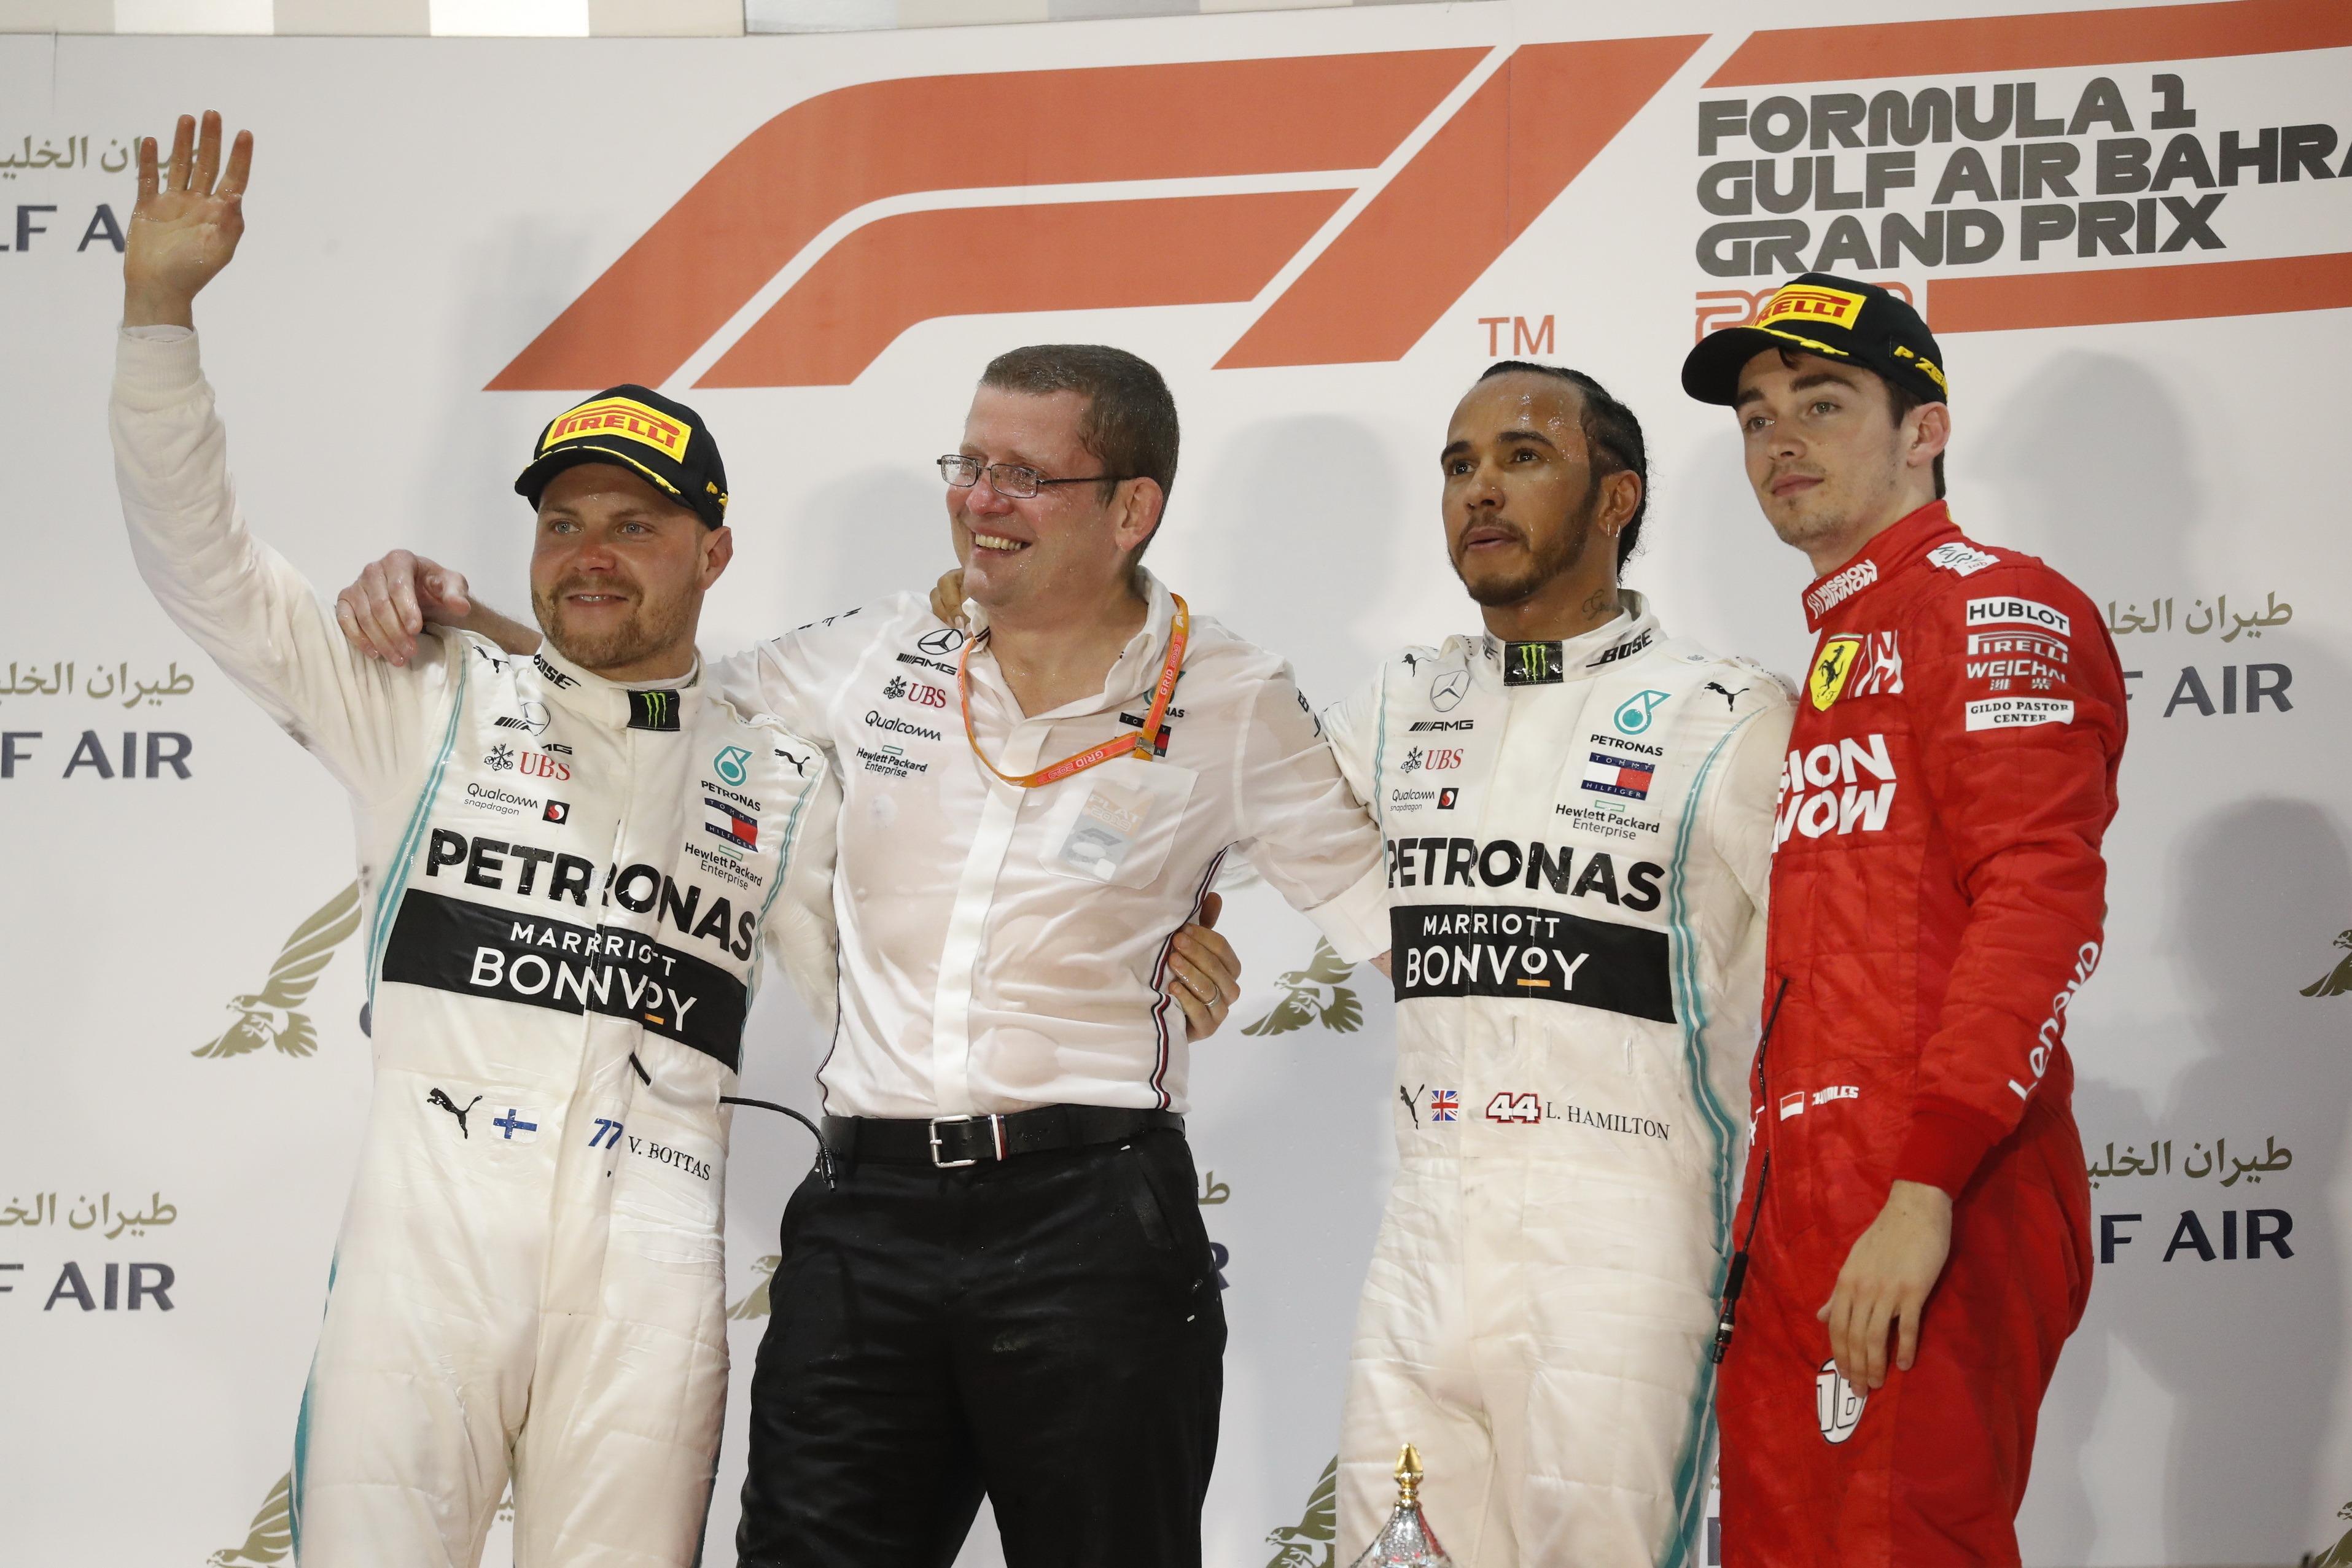 Race Results 2019 Bahrain F1 Grand Prix